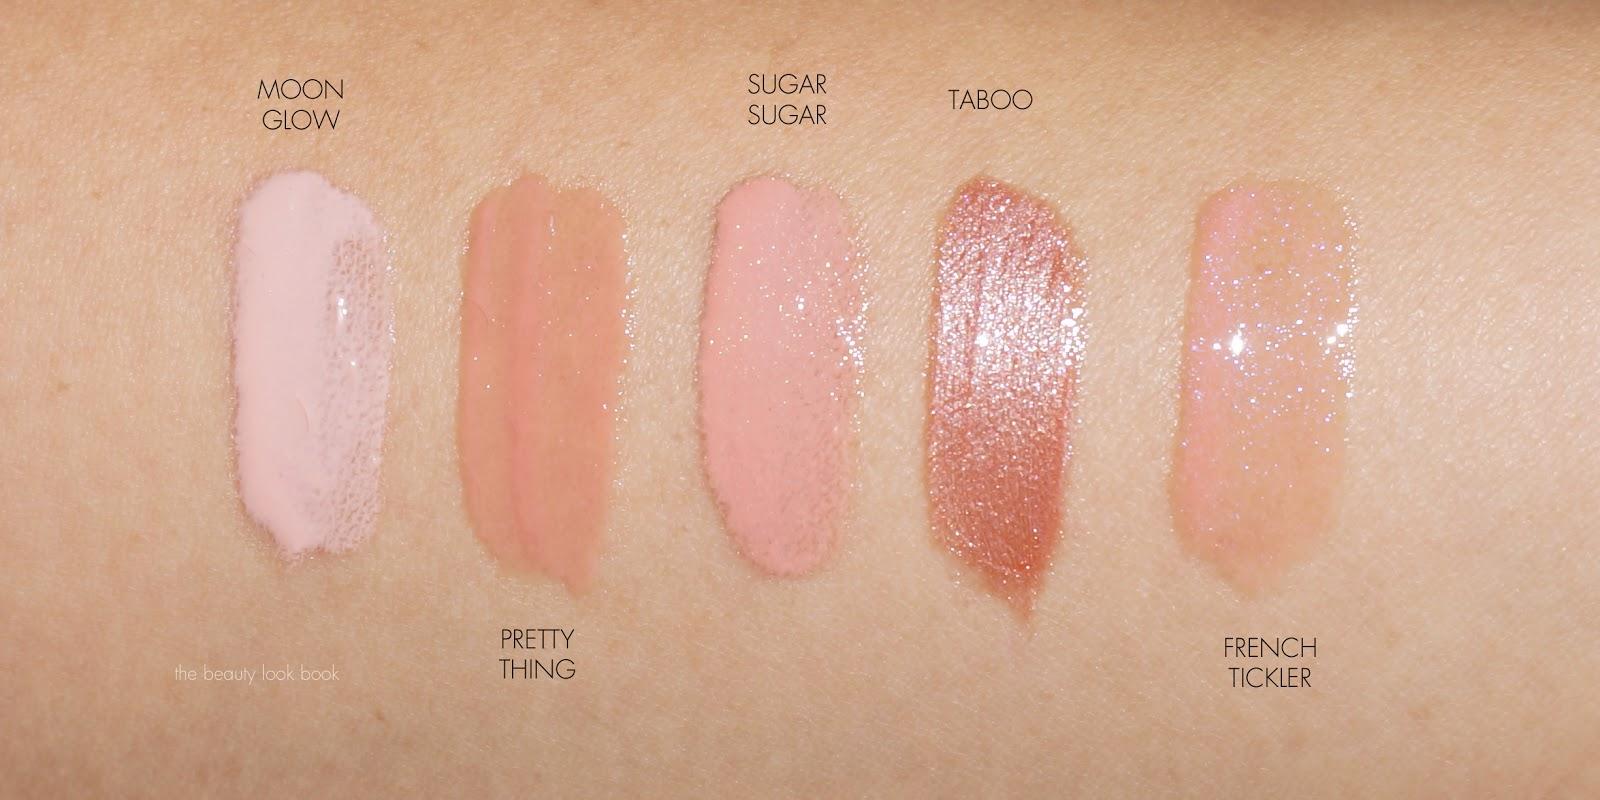 Enamored Lip Hi-Shine Gloss Lip Lacquer by Marc Jacobs Beauty #16